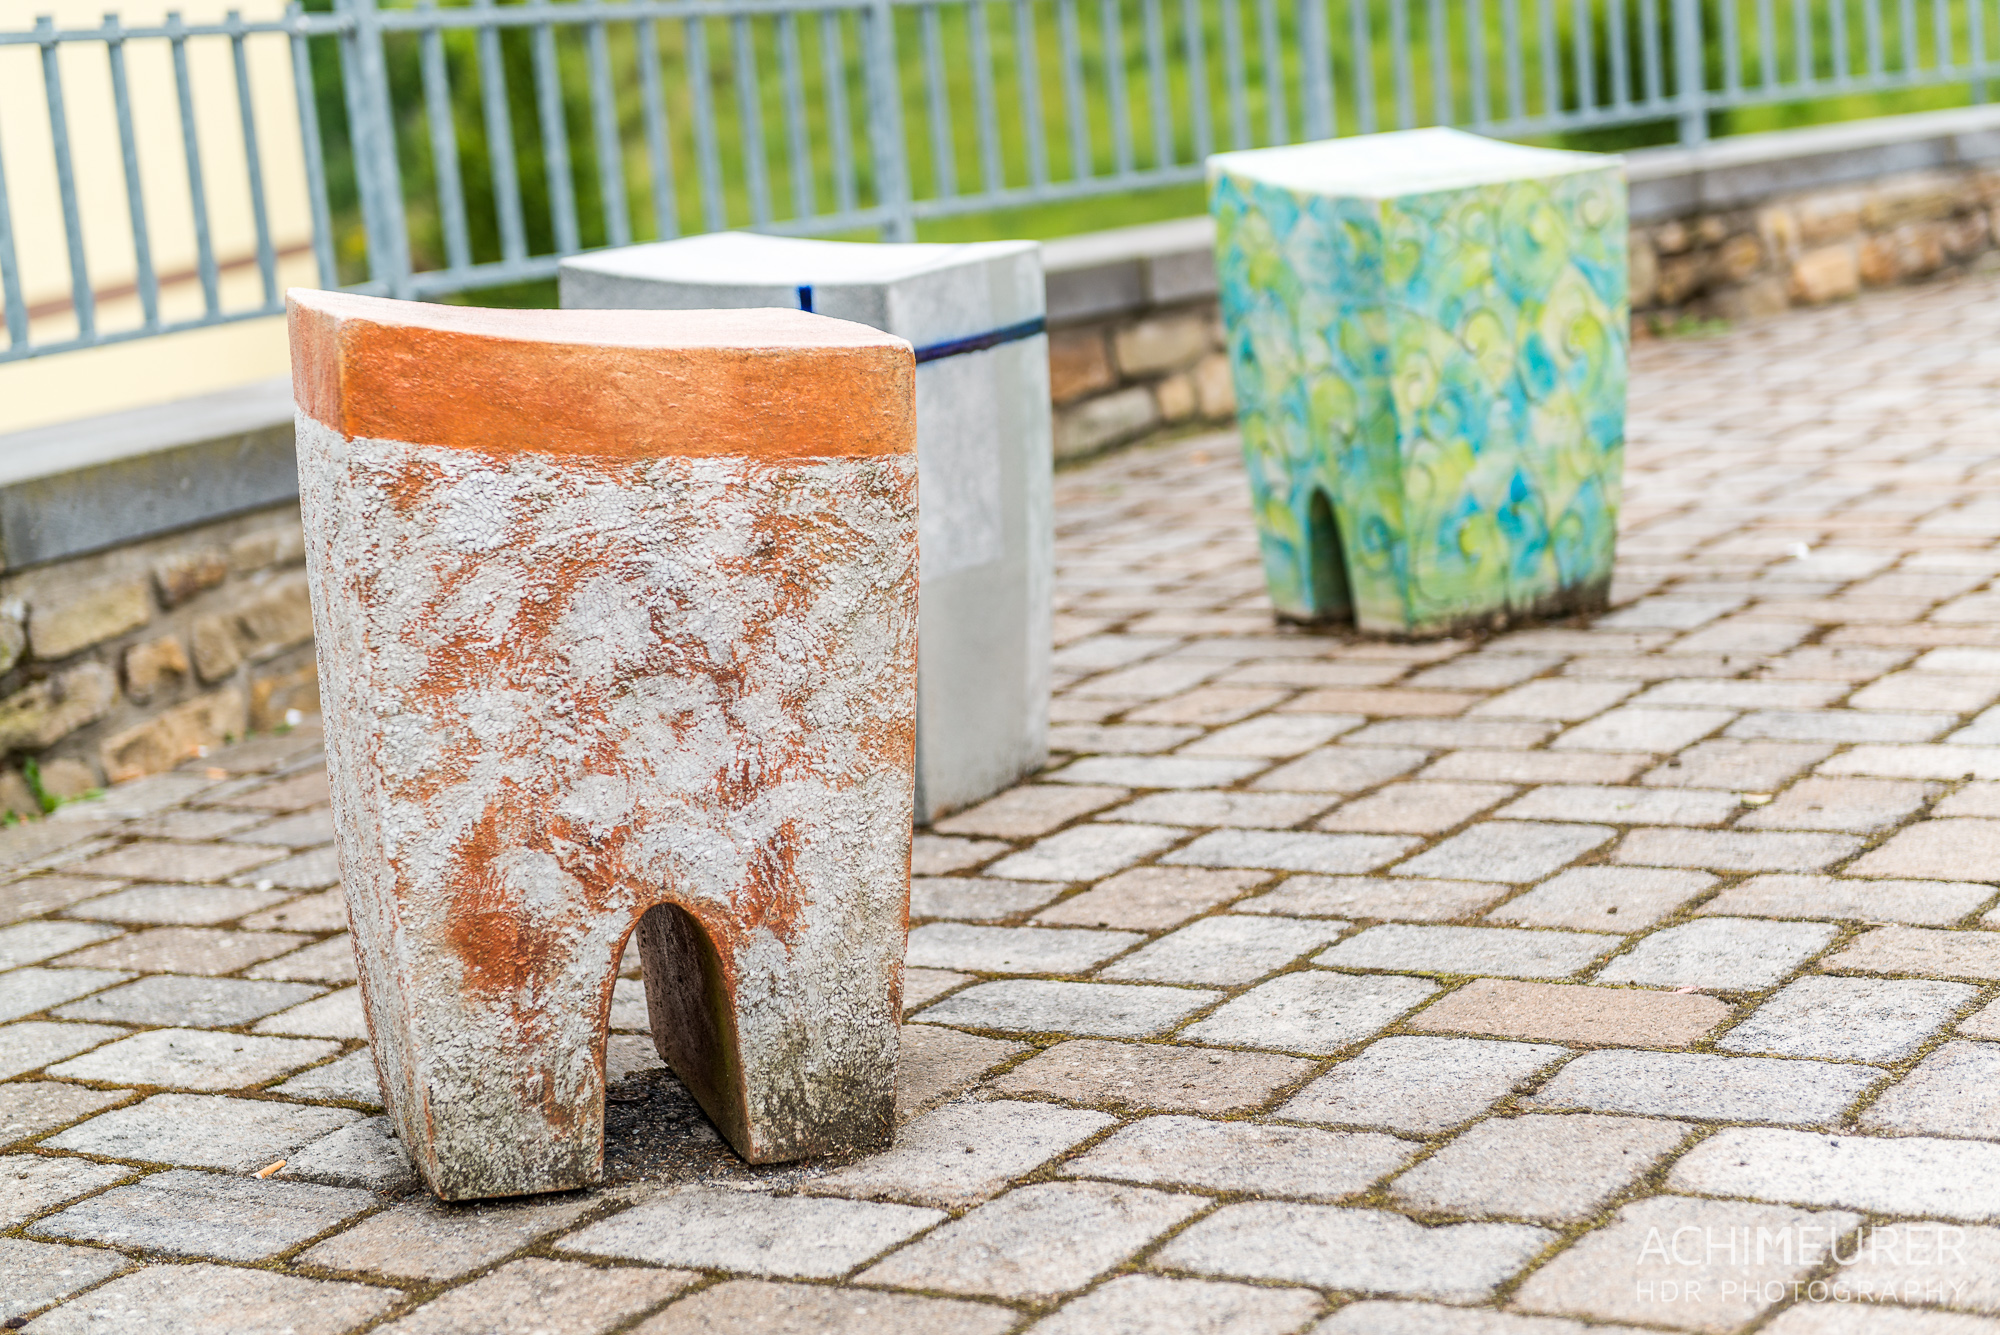 Kannenbaeckerland-keramik_5211